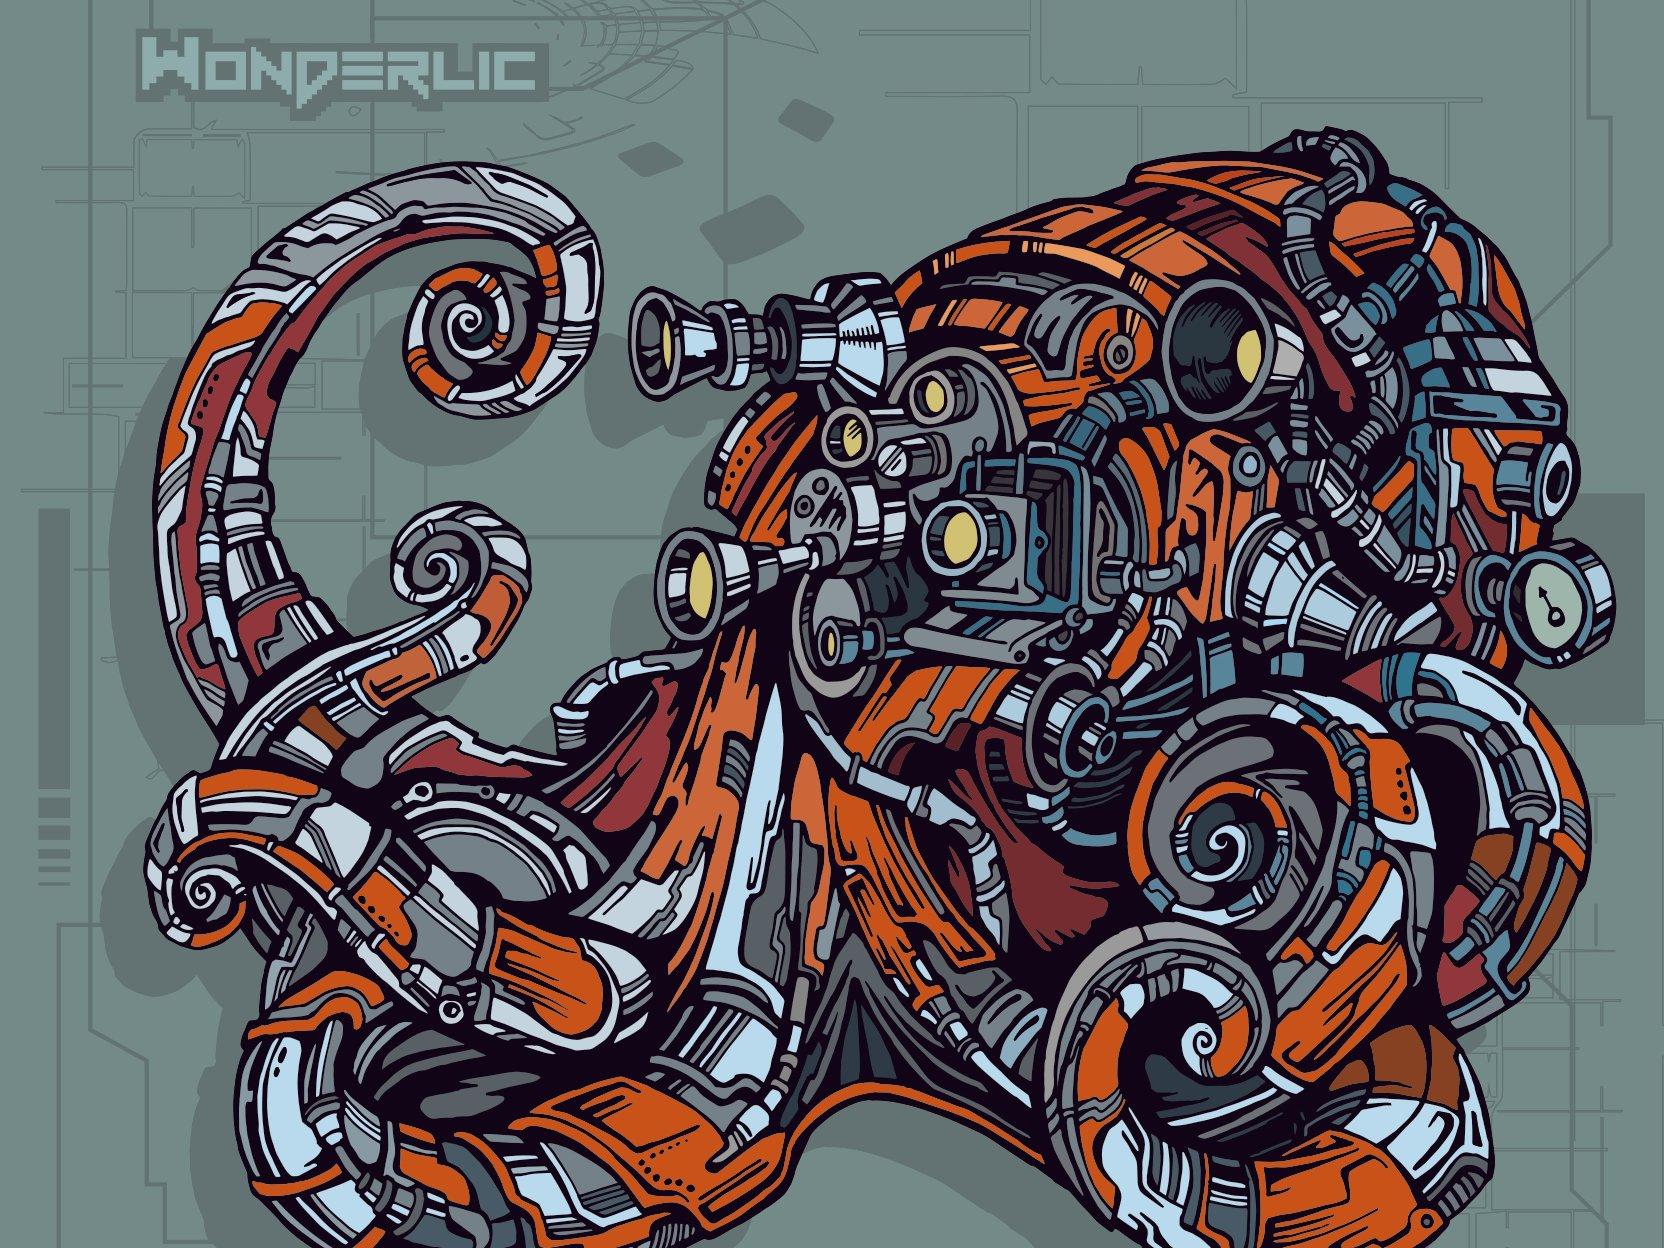 Image for Wonderlic